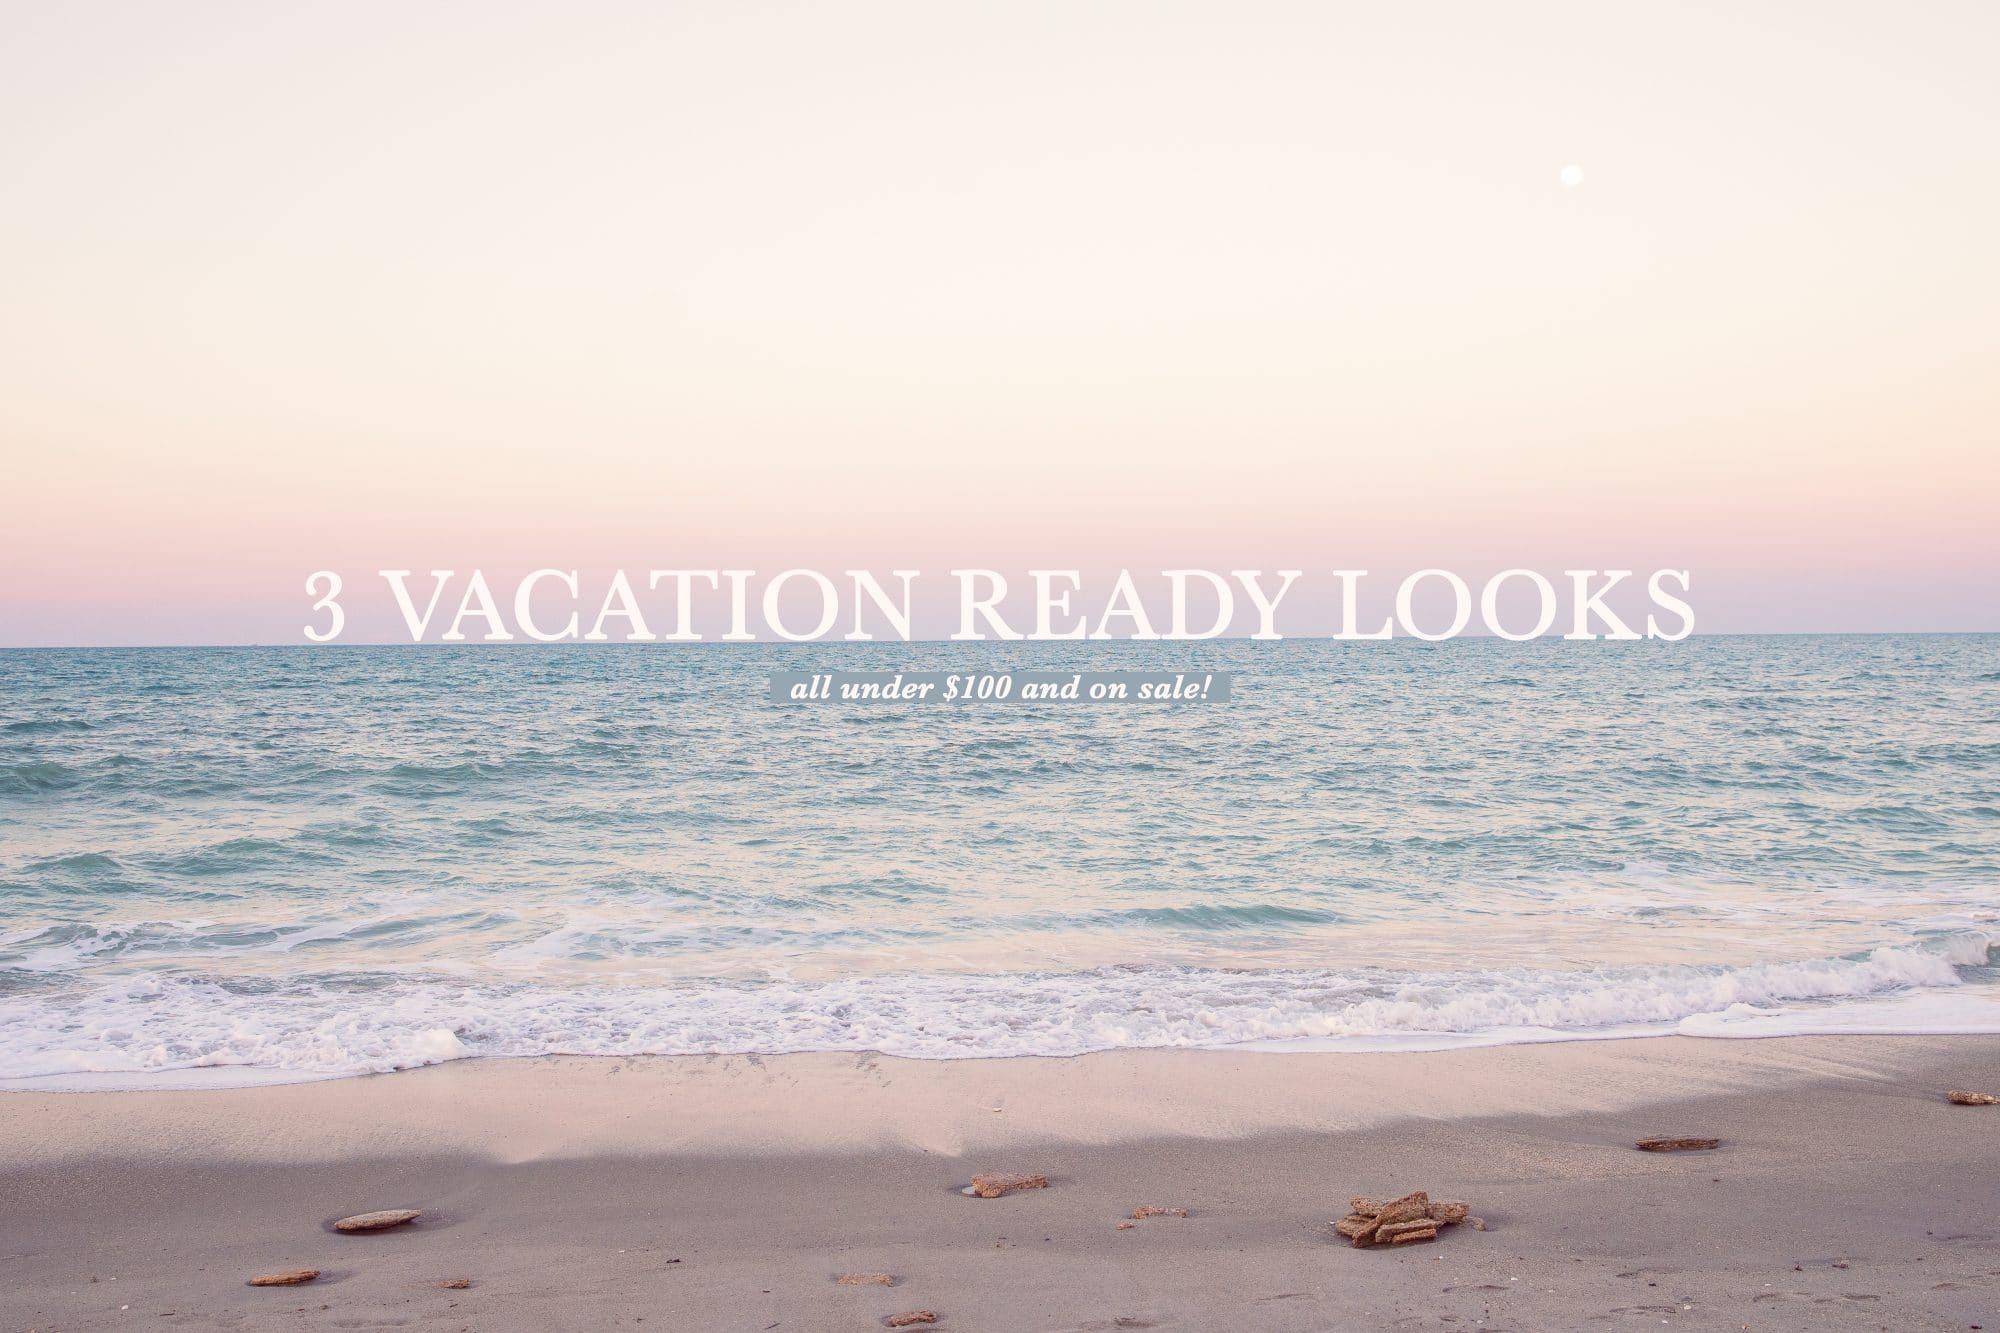 3 Vacation Ready Looks | www.ashleybrookedesigns.com